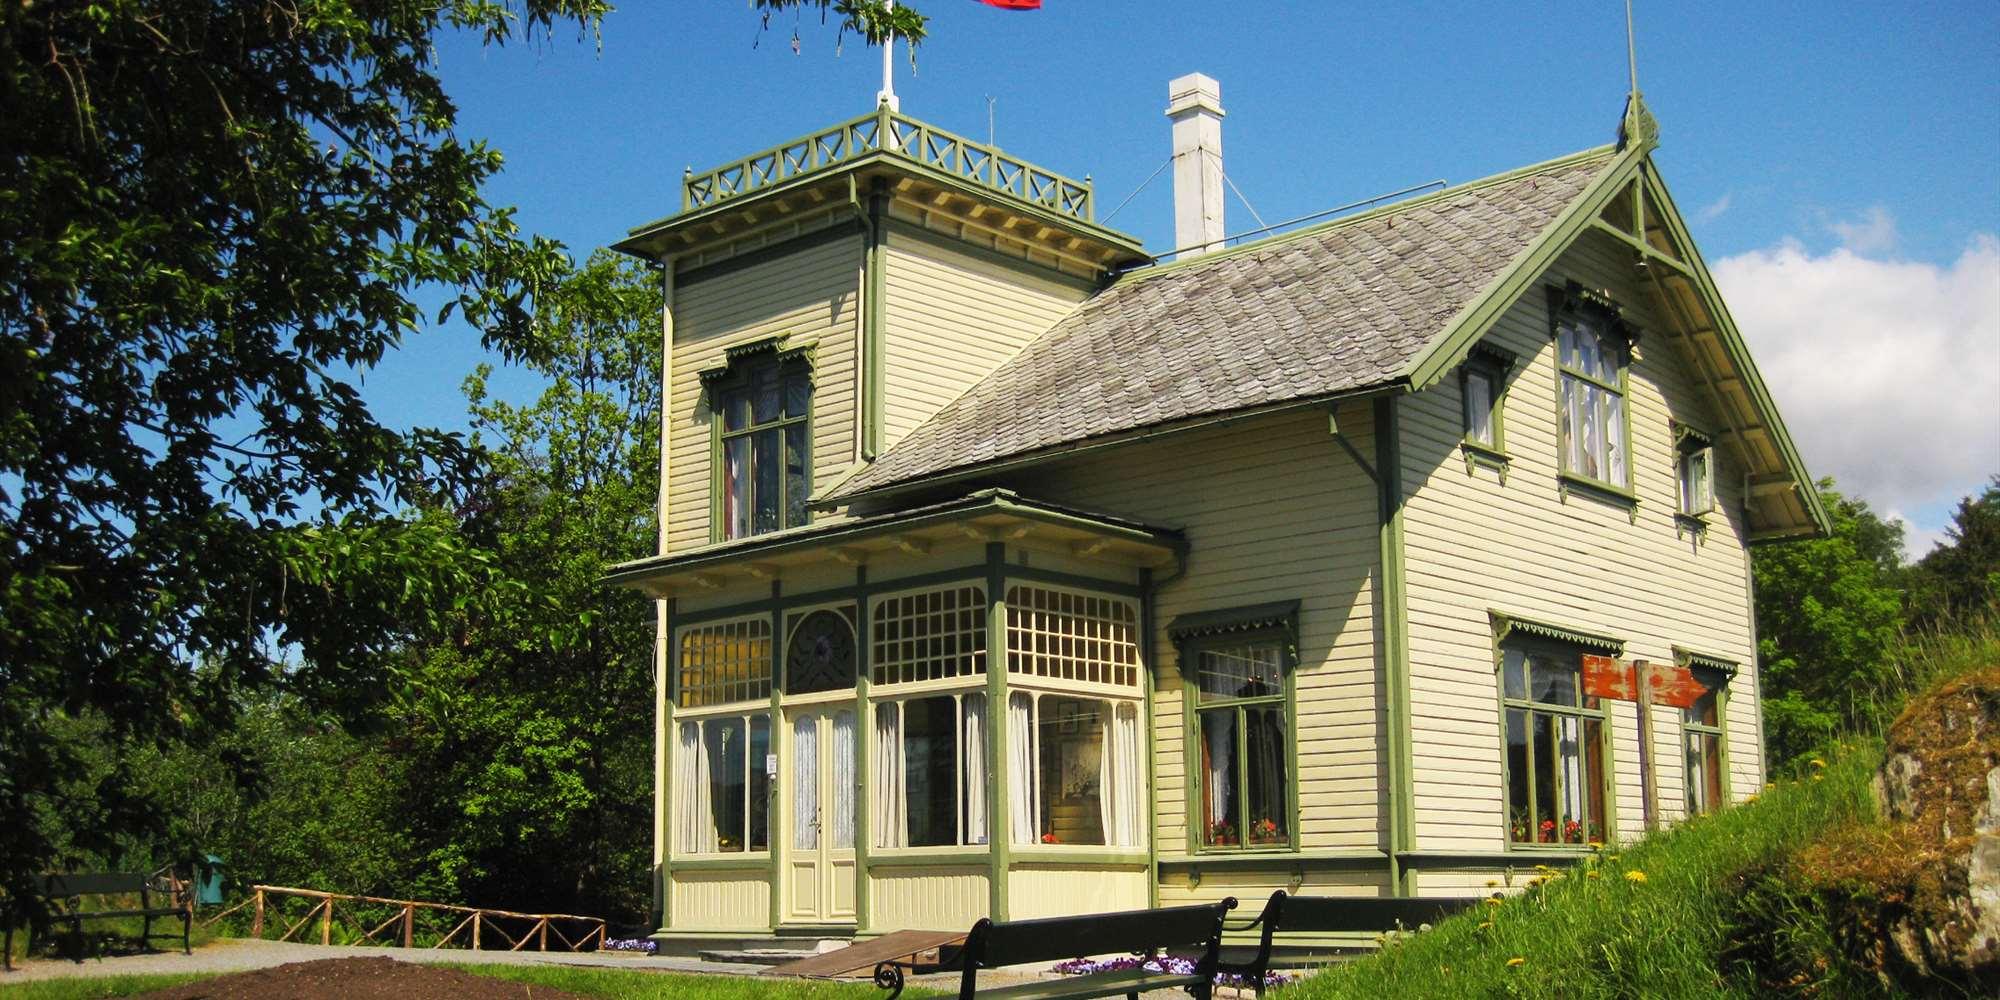 Surprising Troldhaugen Home Of Composer Edvard Grieg Visitbergen Com Cjindustries Chair Design For Home Cjindustriesco